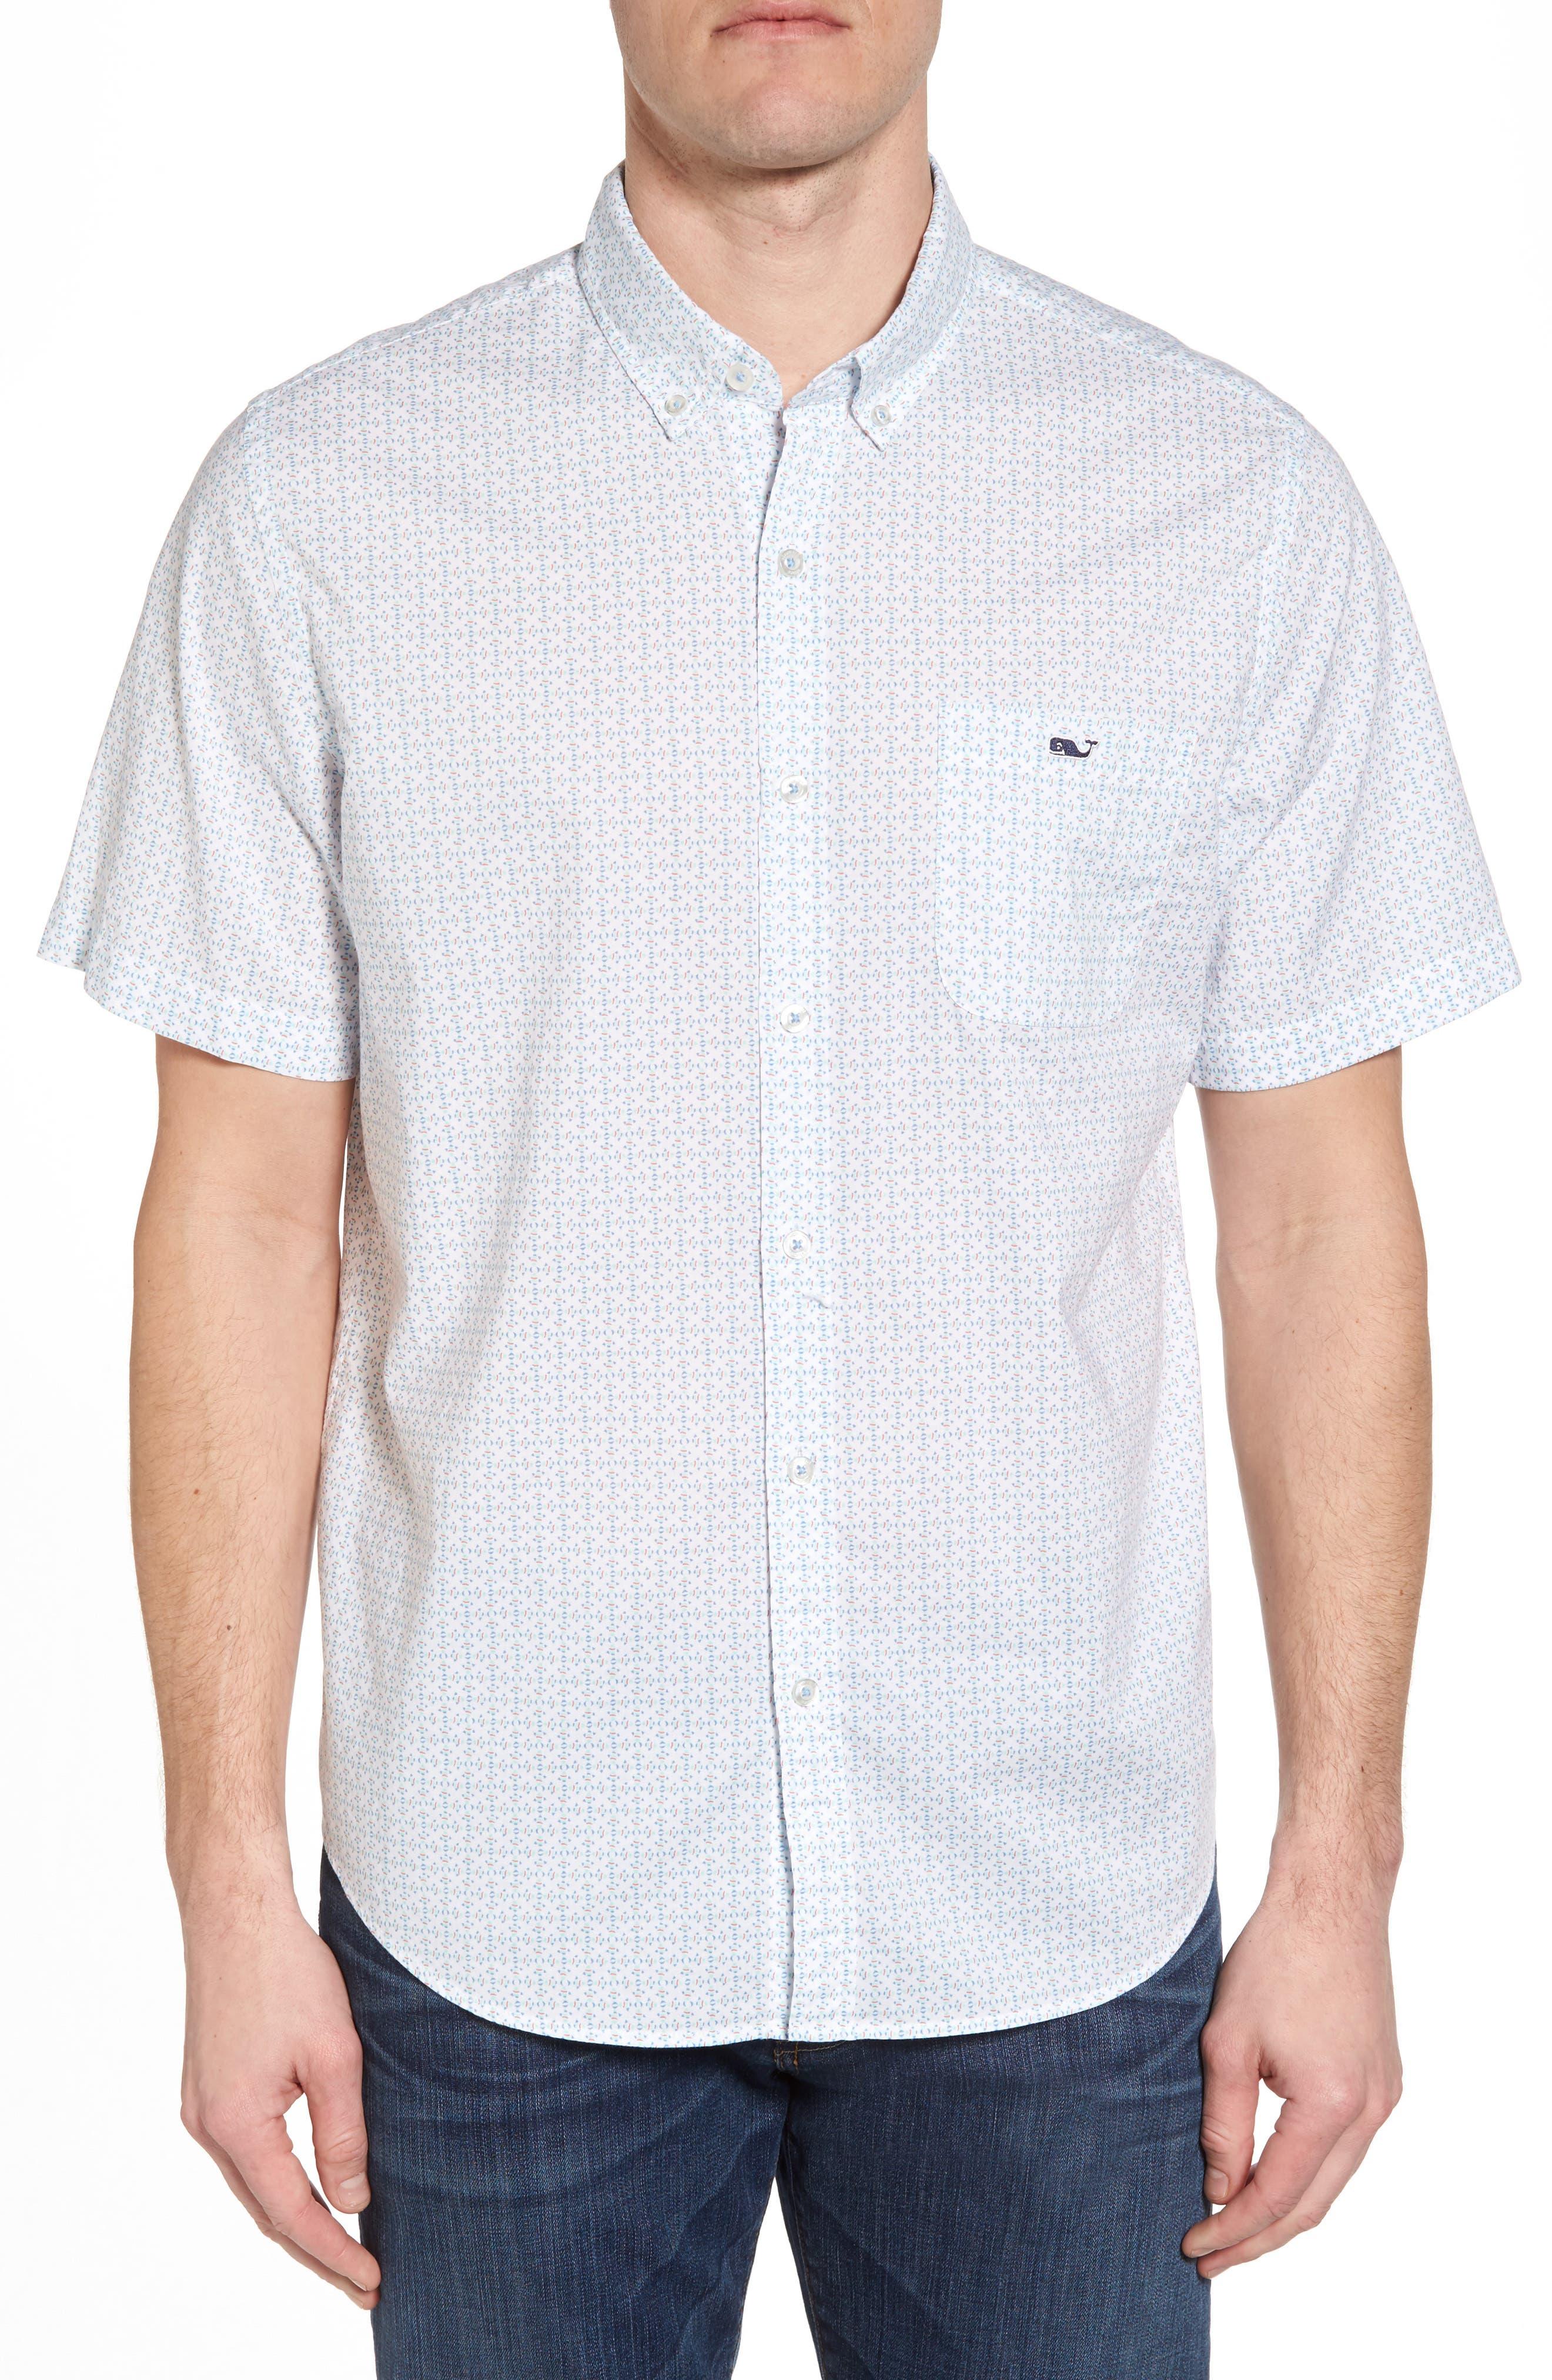 Fish Check Tucker Slim Fit Sport Shirt,                             Main thumbnail 1, color,                             100